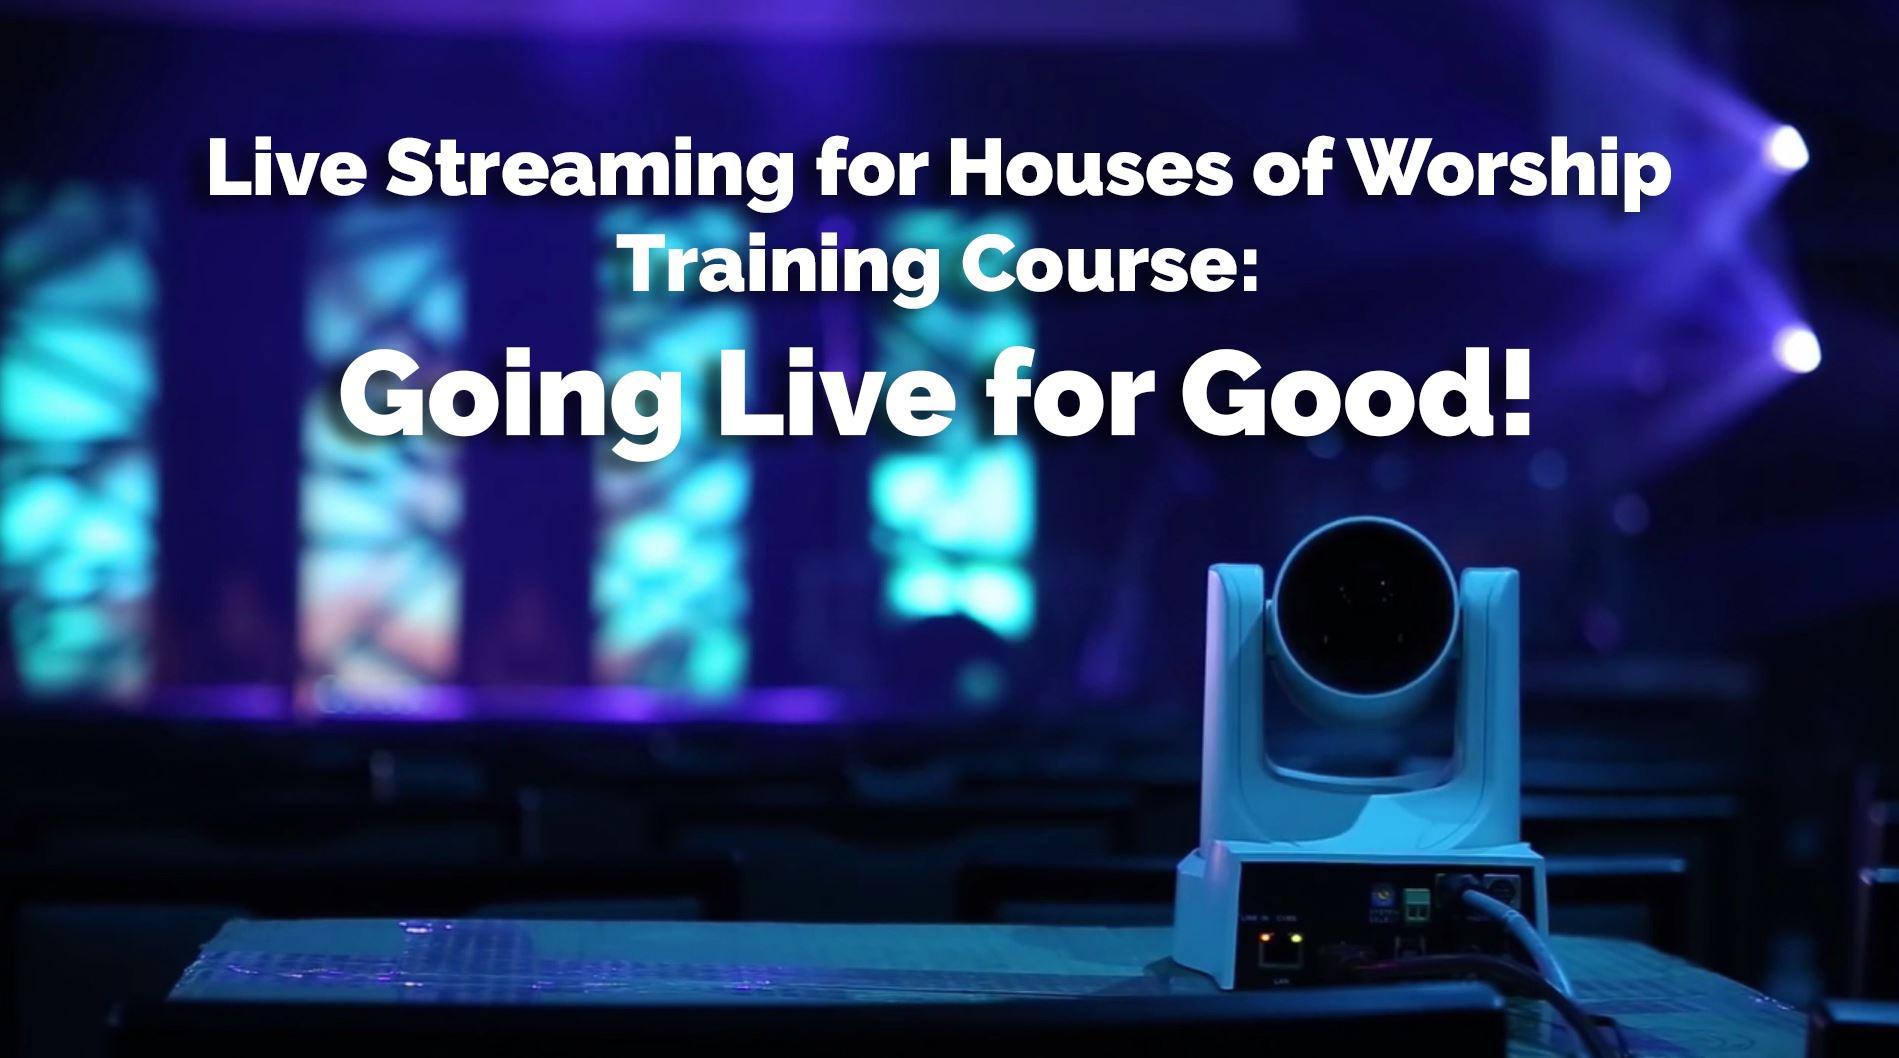 Church Training Course